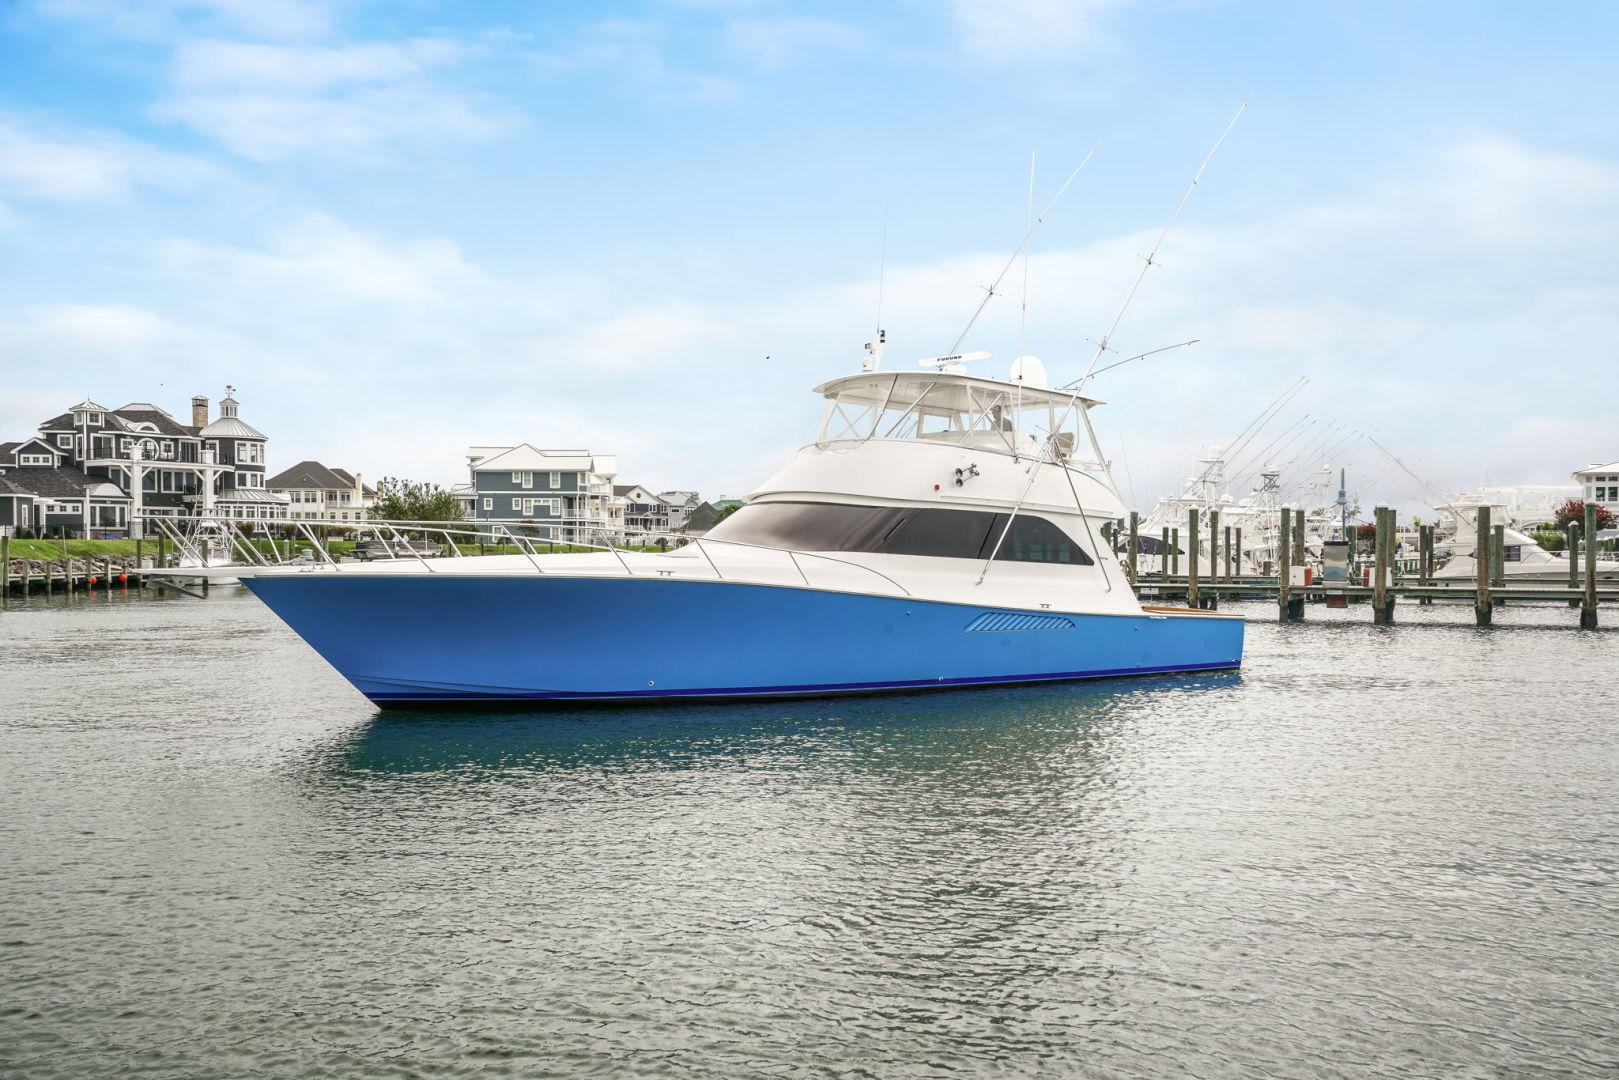 Viking-Convertible 2002-Blue Eyes North Palm Beach-Florida-United States-Blue Eyes-1490195   Thumbnail